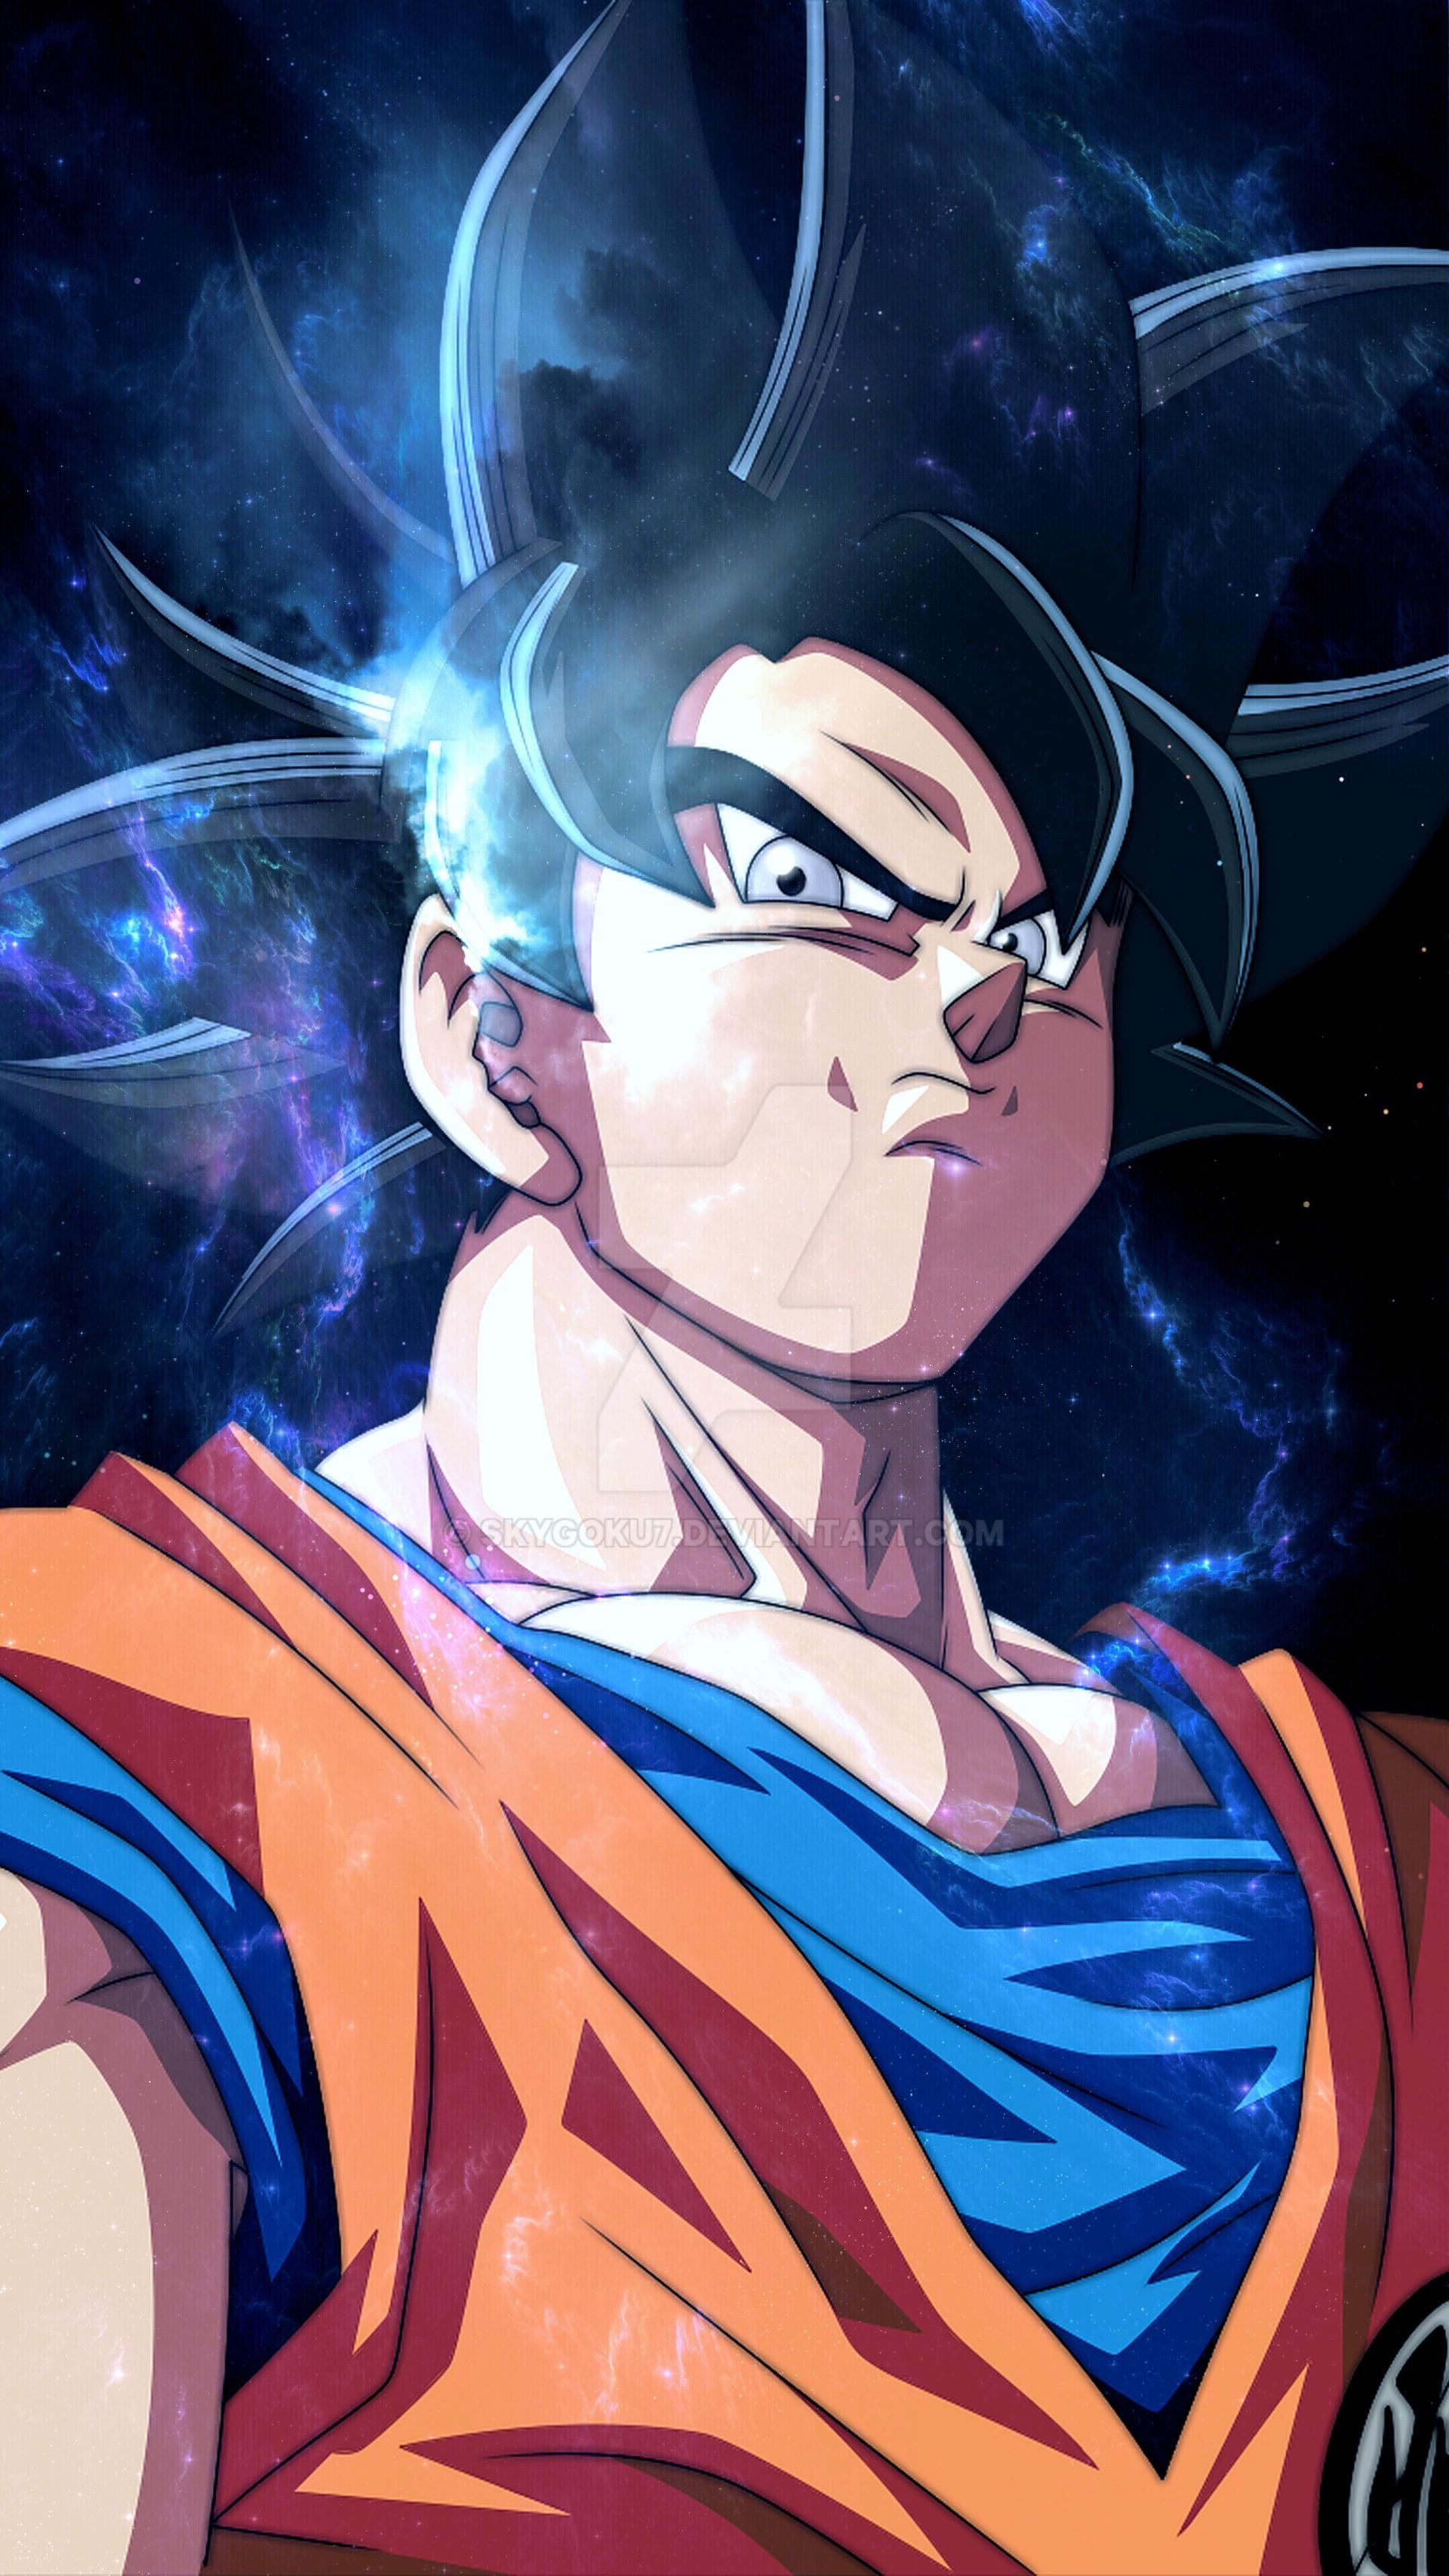 Goku Ultra Instinct Wallpaper Edit By Skygoku7 On Deviantart